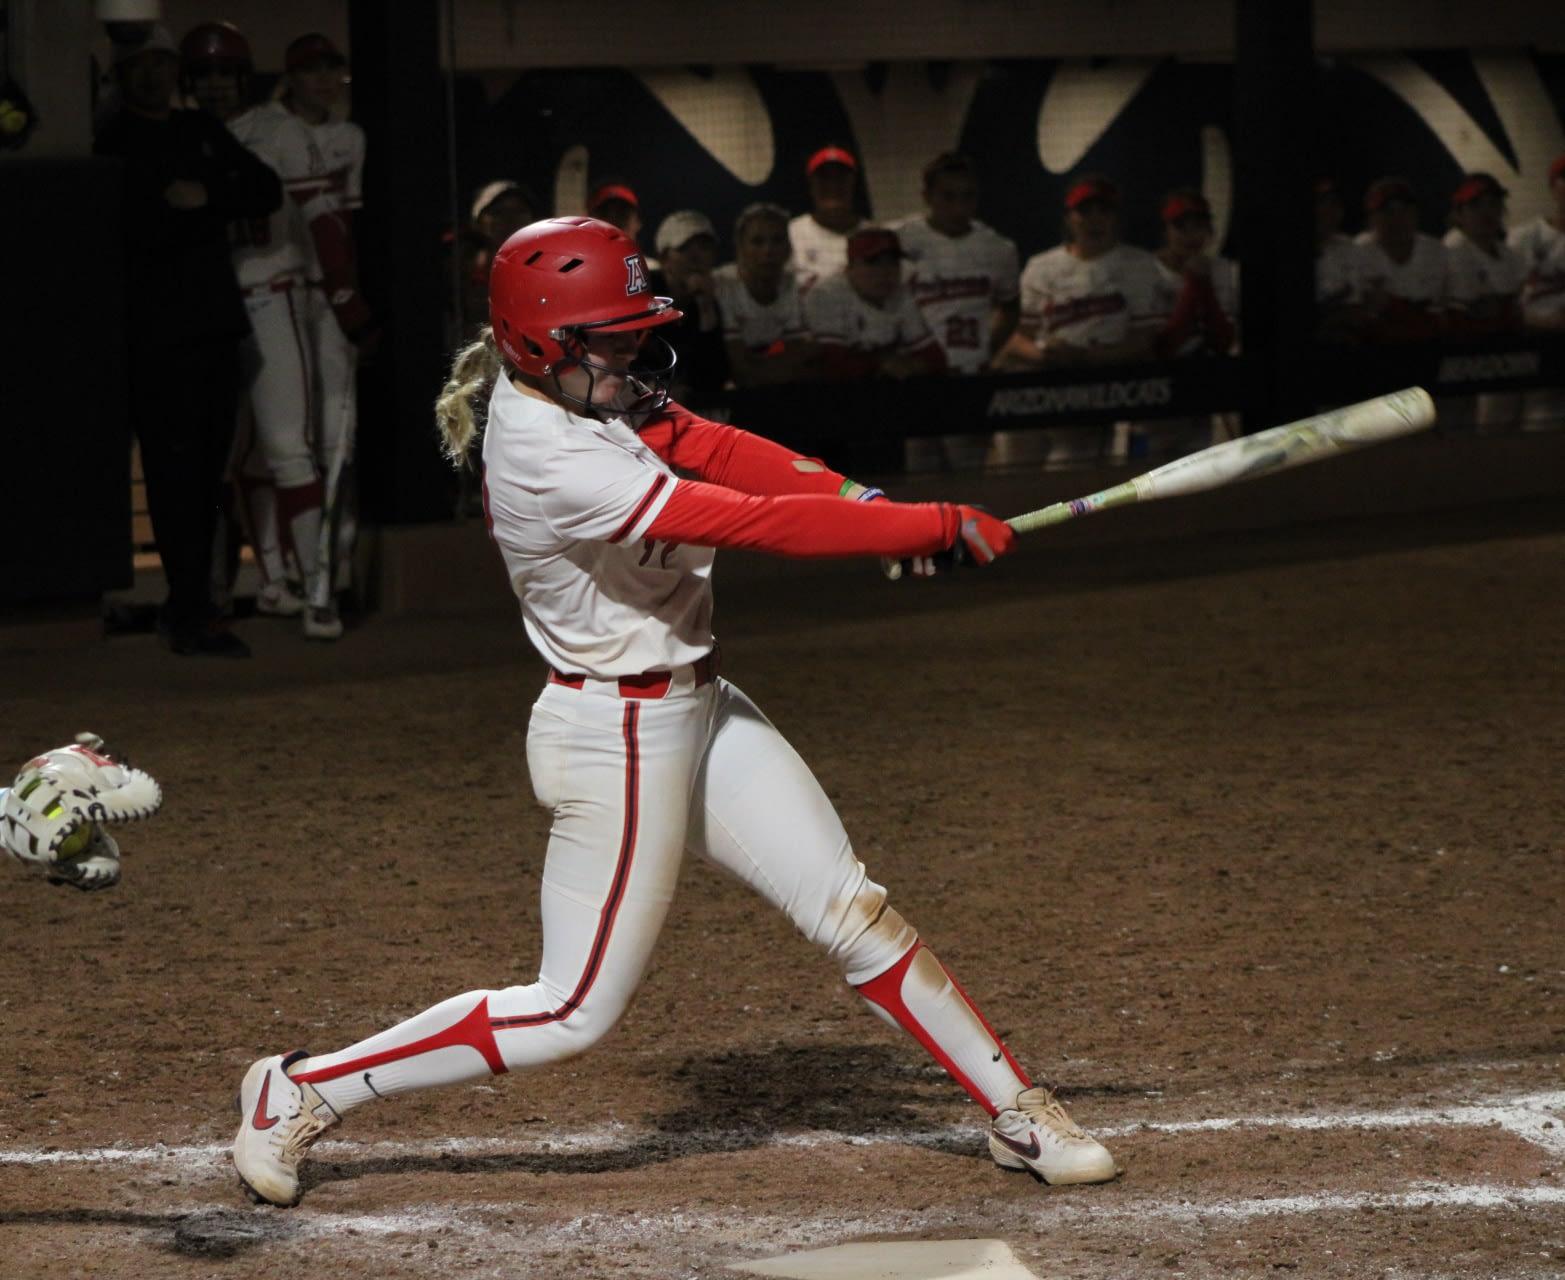 Jessie-Harper-vs.-Team-USA-Two-home-run-game